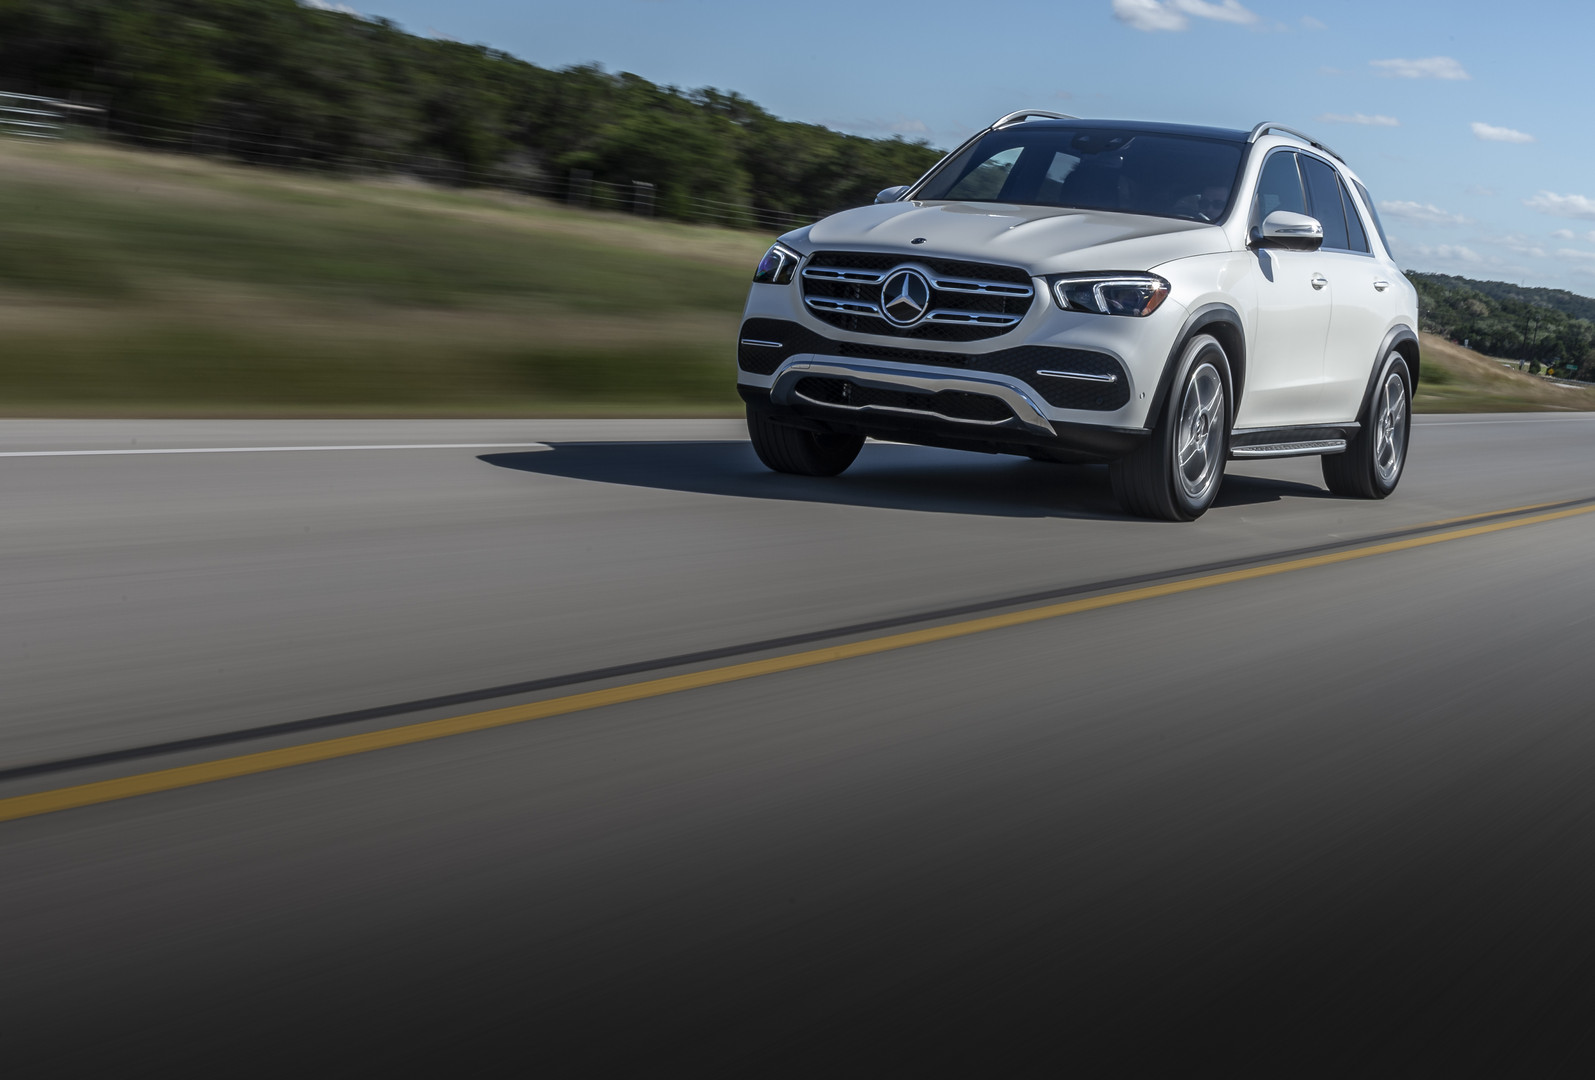 2019 Mercedes-Benz GLE Exterior